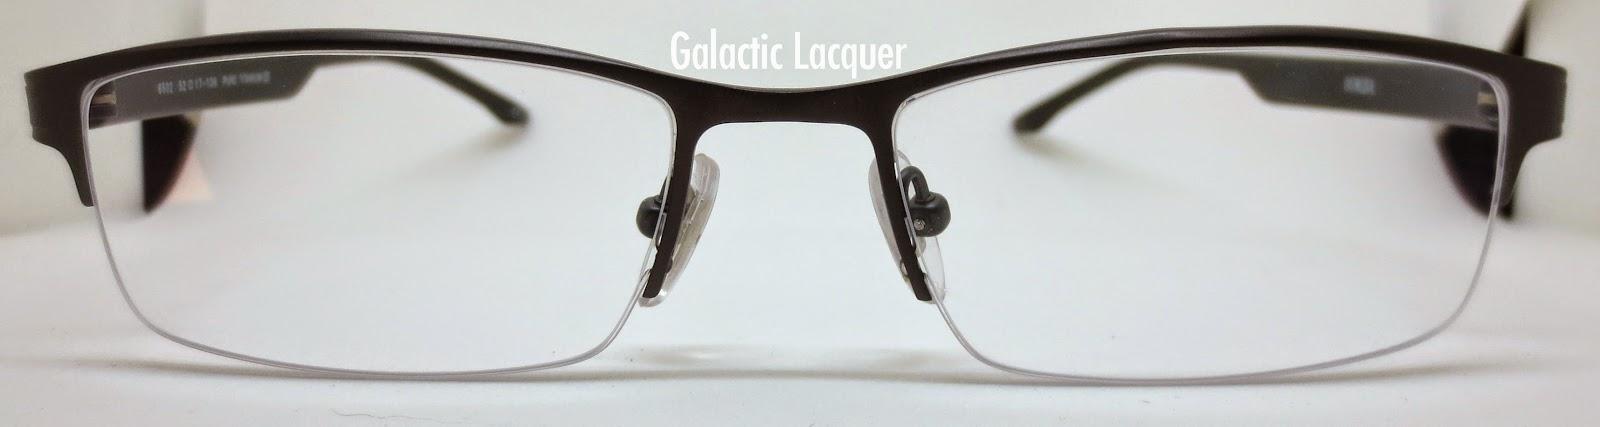 15daff93722 Galactic Lacquer  Firmoo - Gunmetal Glasses